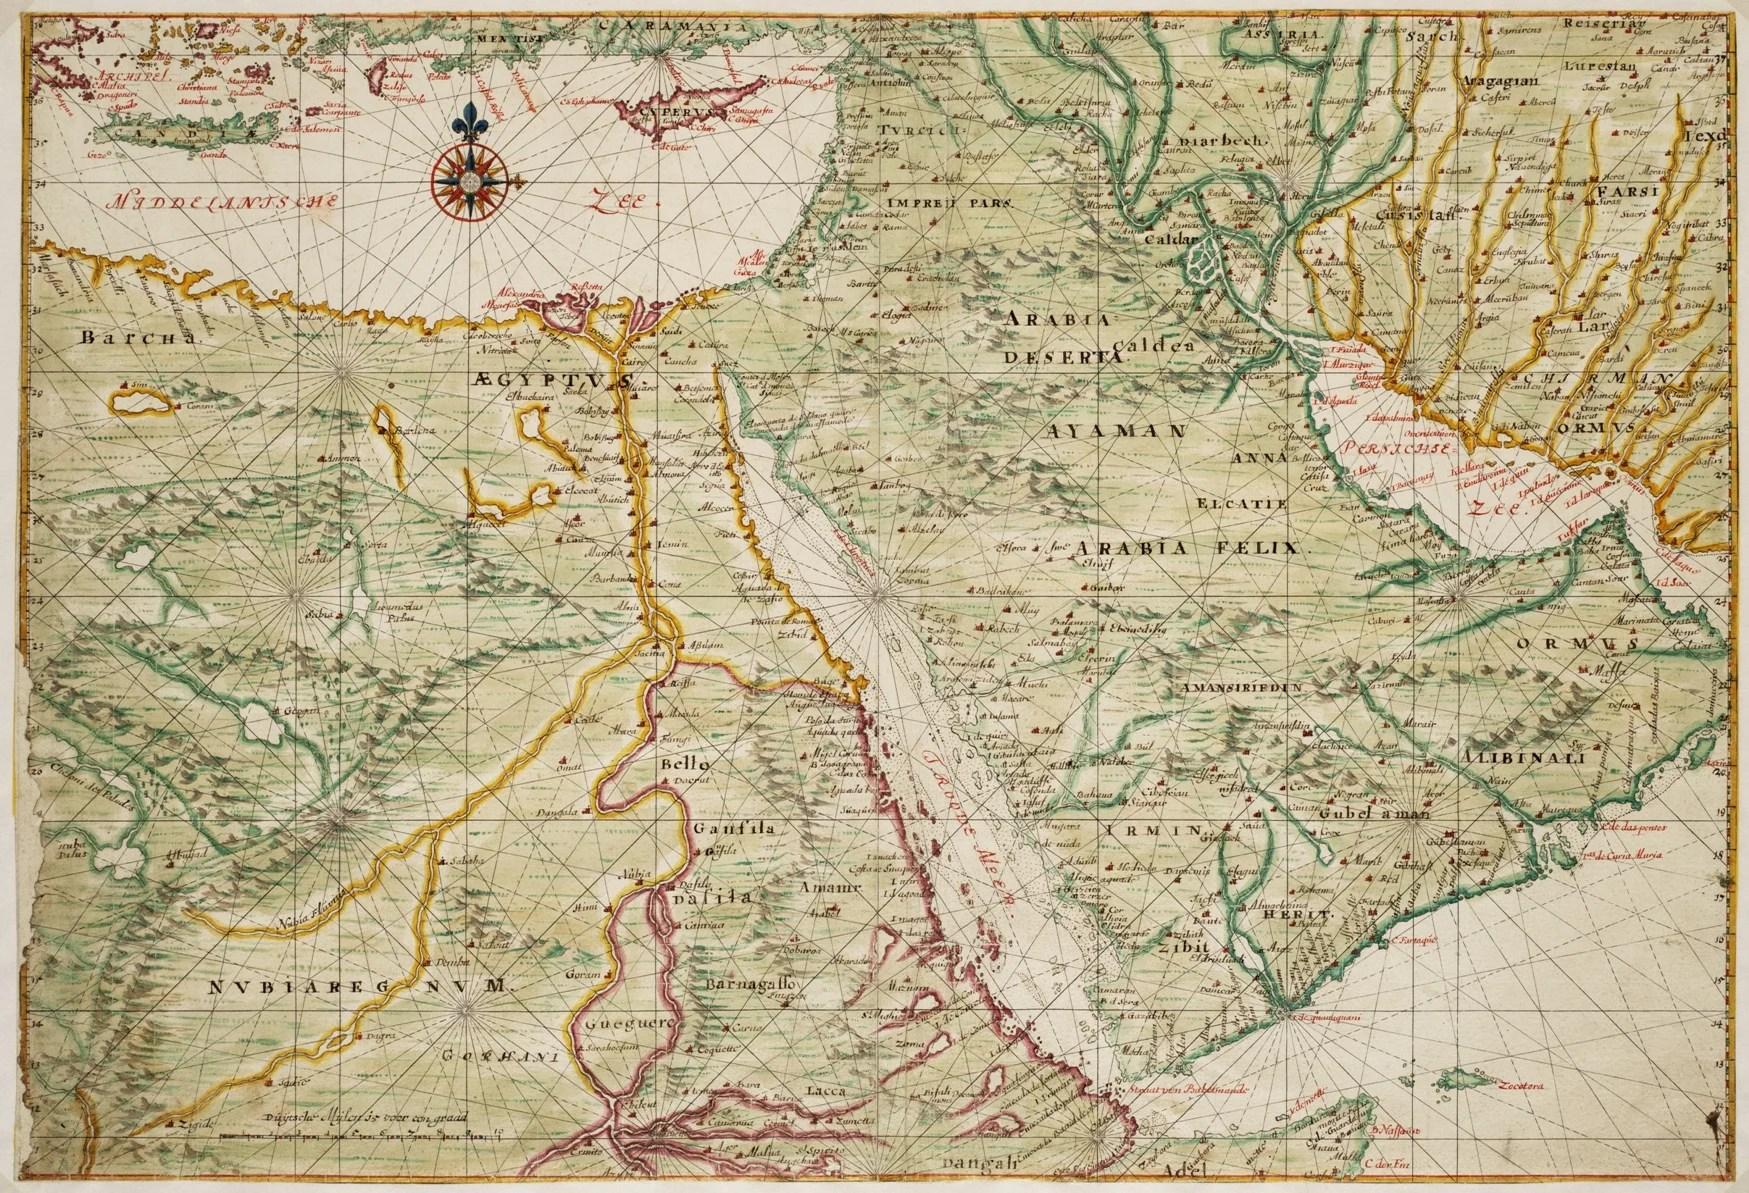 photo about Free Printable Vintage Maps named Good Traditional Map Photos XL21 Advancedmagebysara